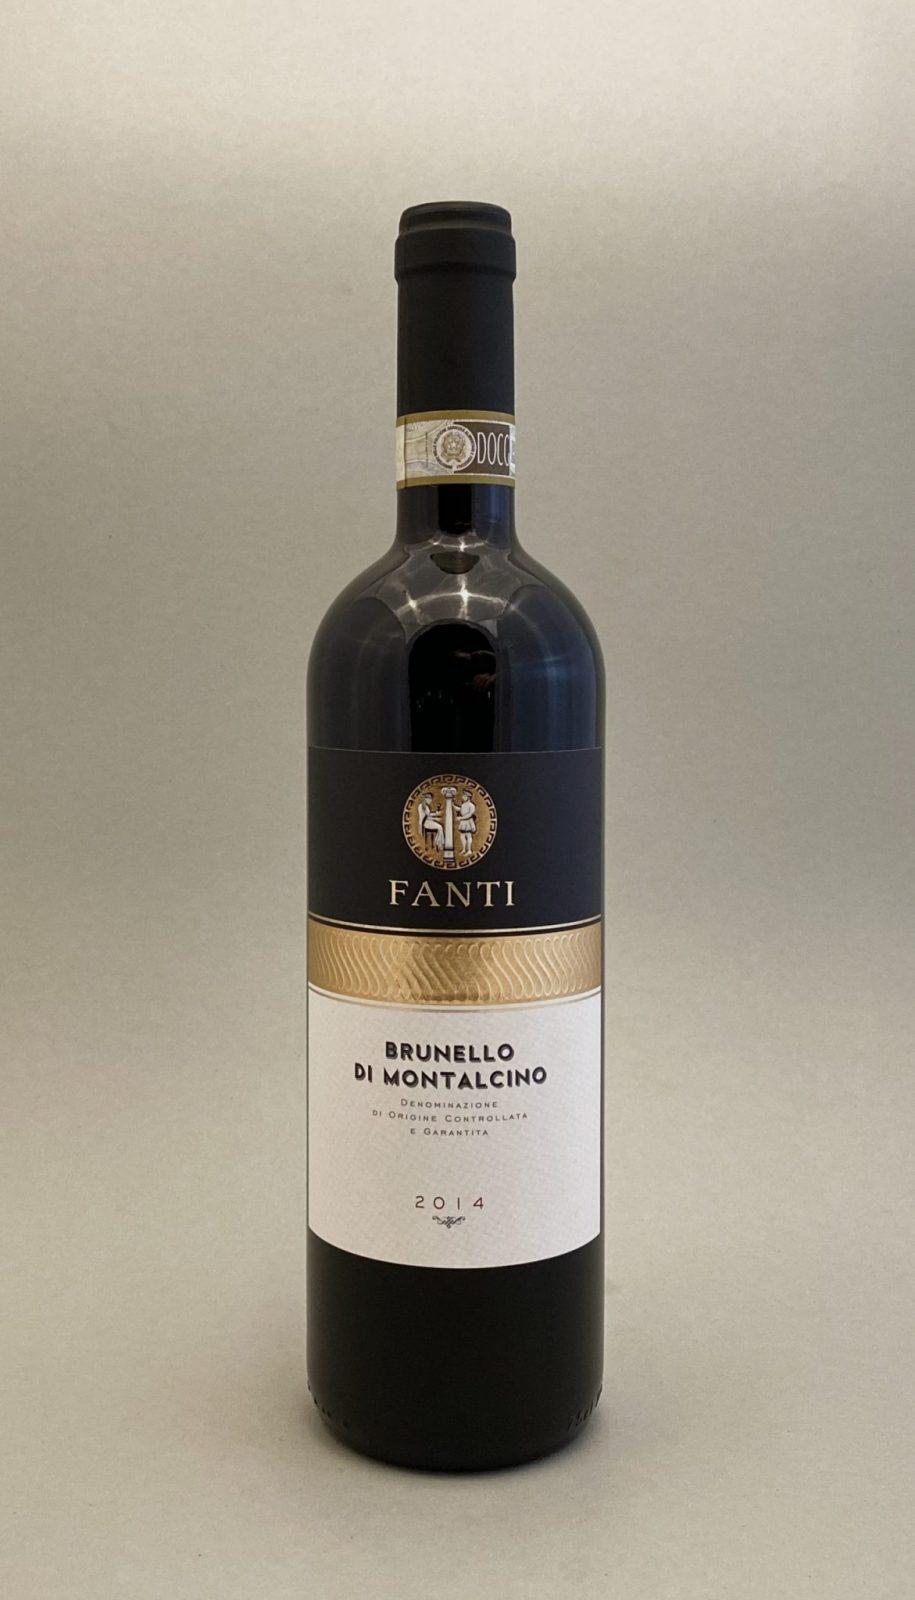 FANTI Brunello Di Montalcino 2014, vinoteka Sunny wines slnecnice mesto Bratislava, petrzalka, vino červené z Talianska, rozvoz vín, eshop